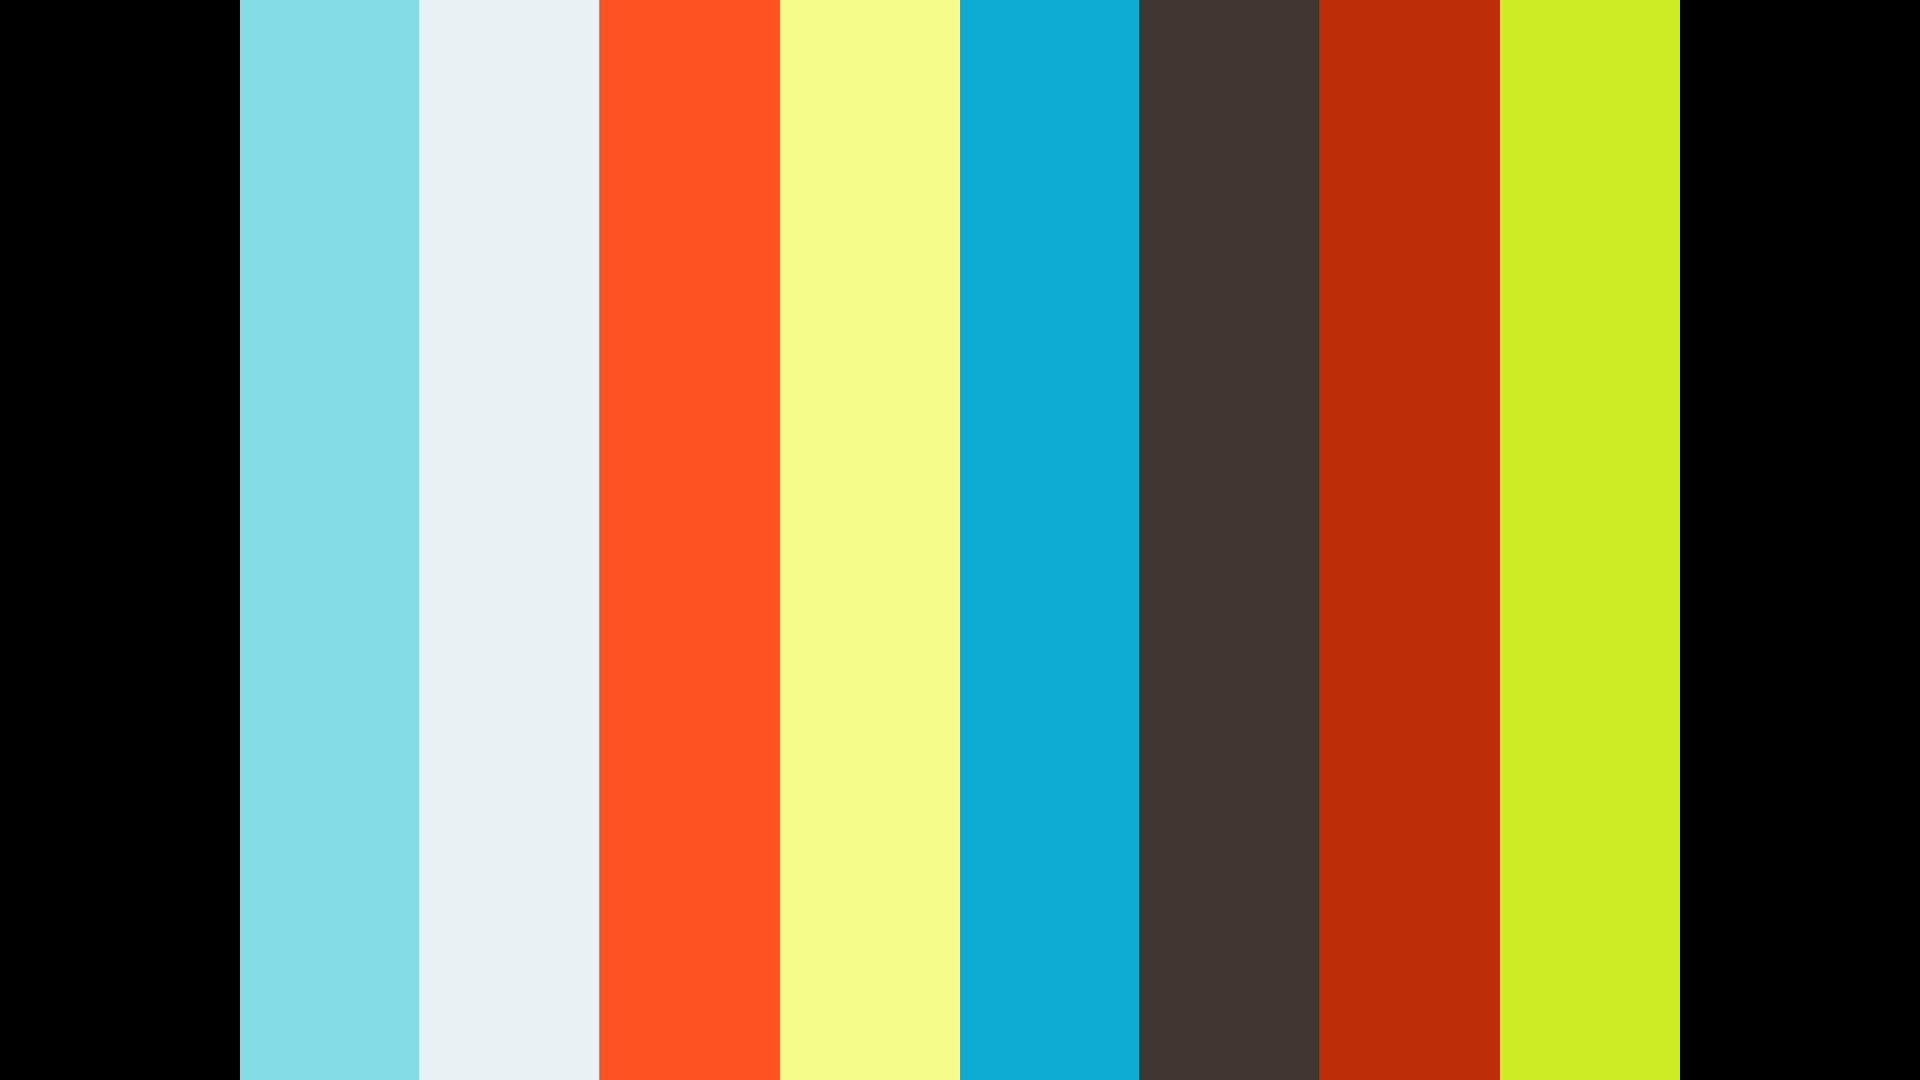 2020-11-16 ILOT LEBRIS - NC - SKYVIEW